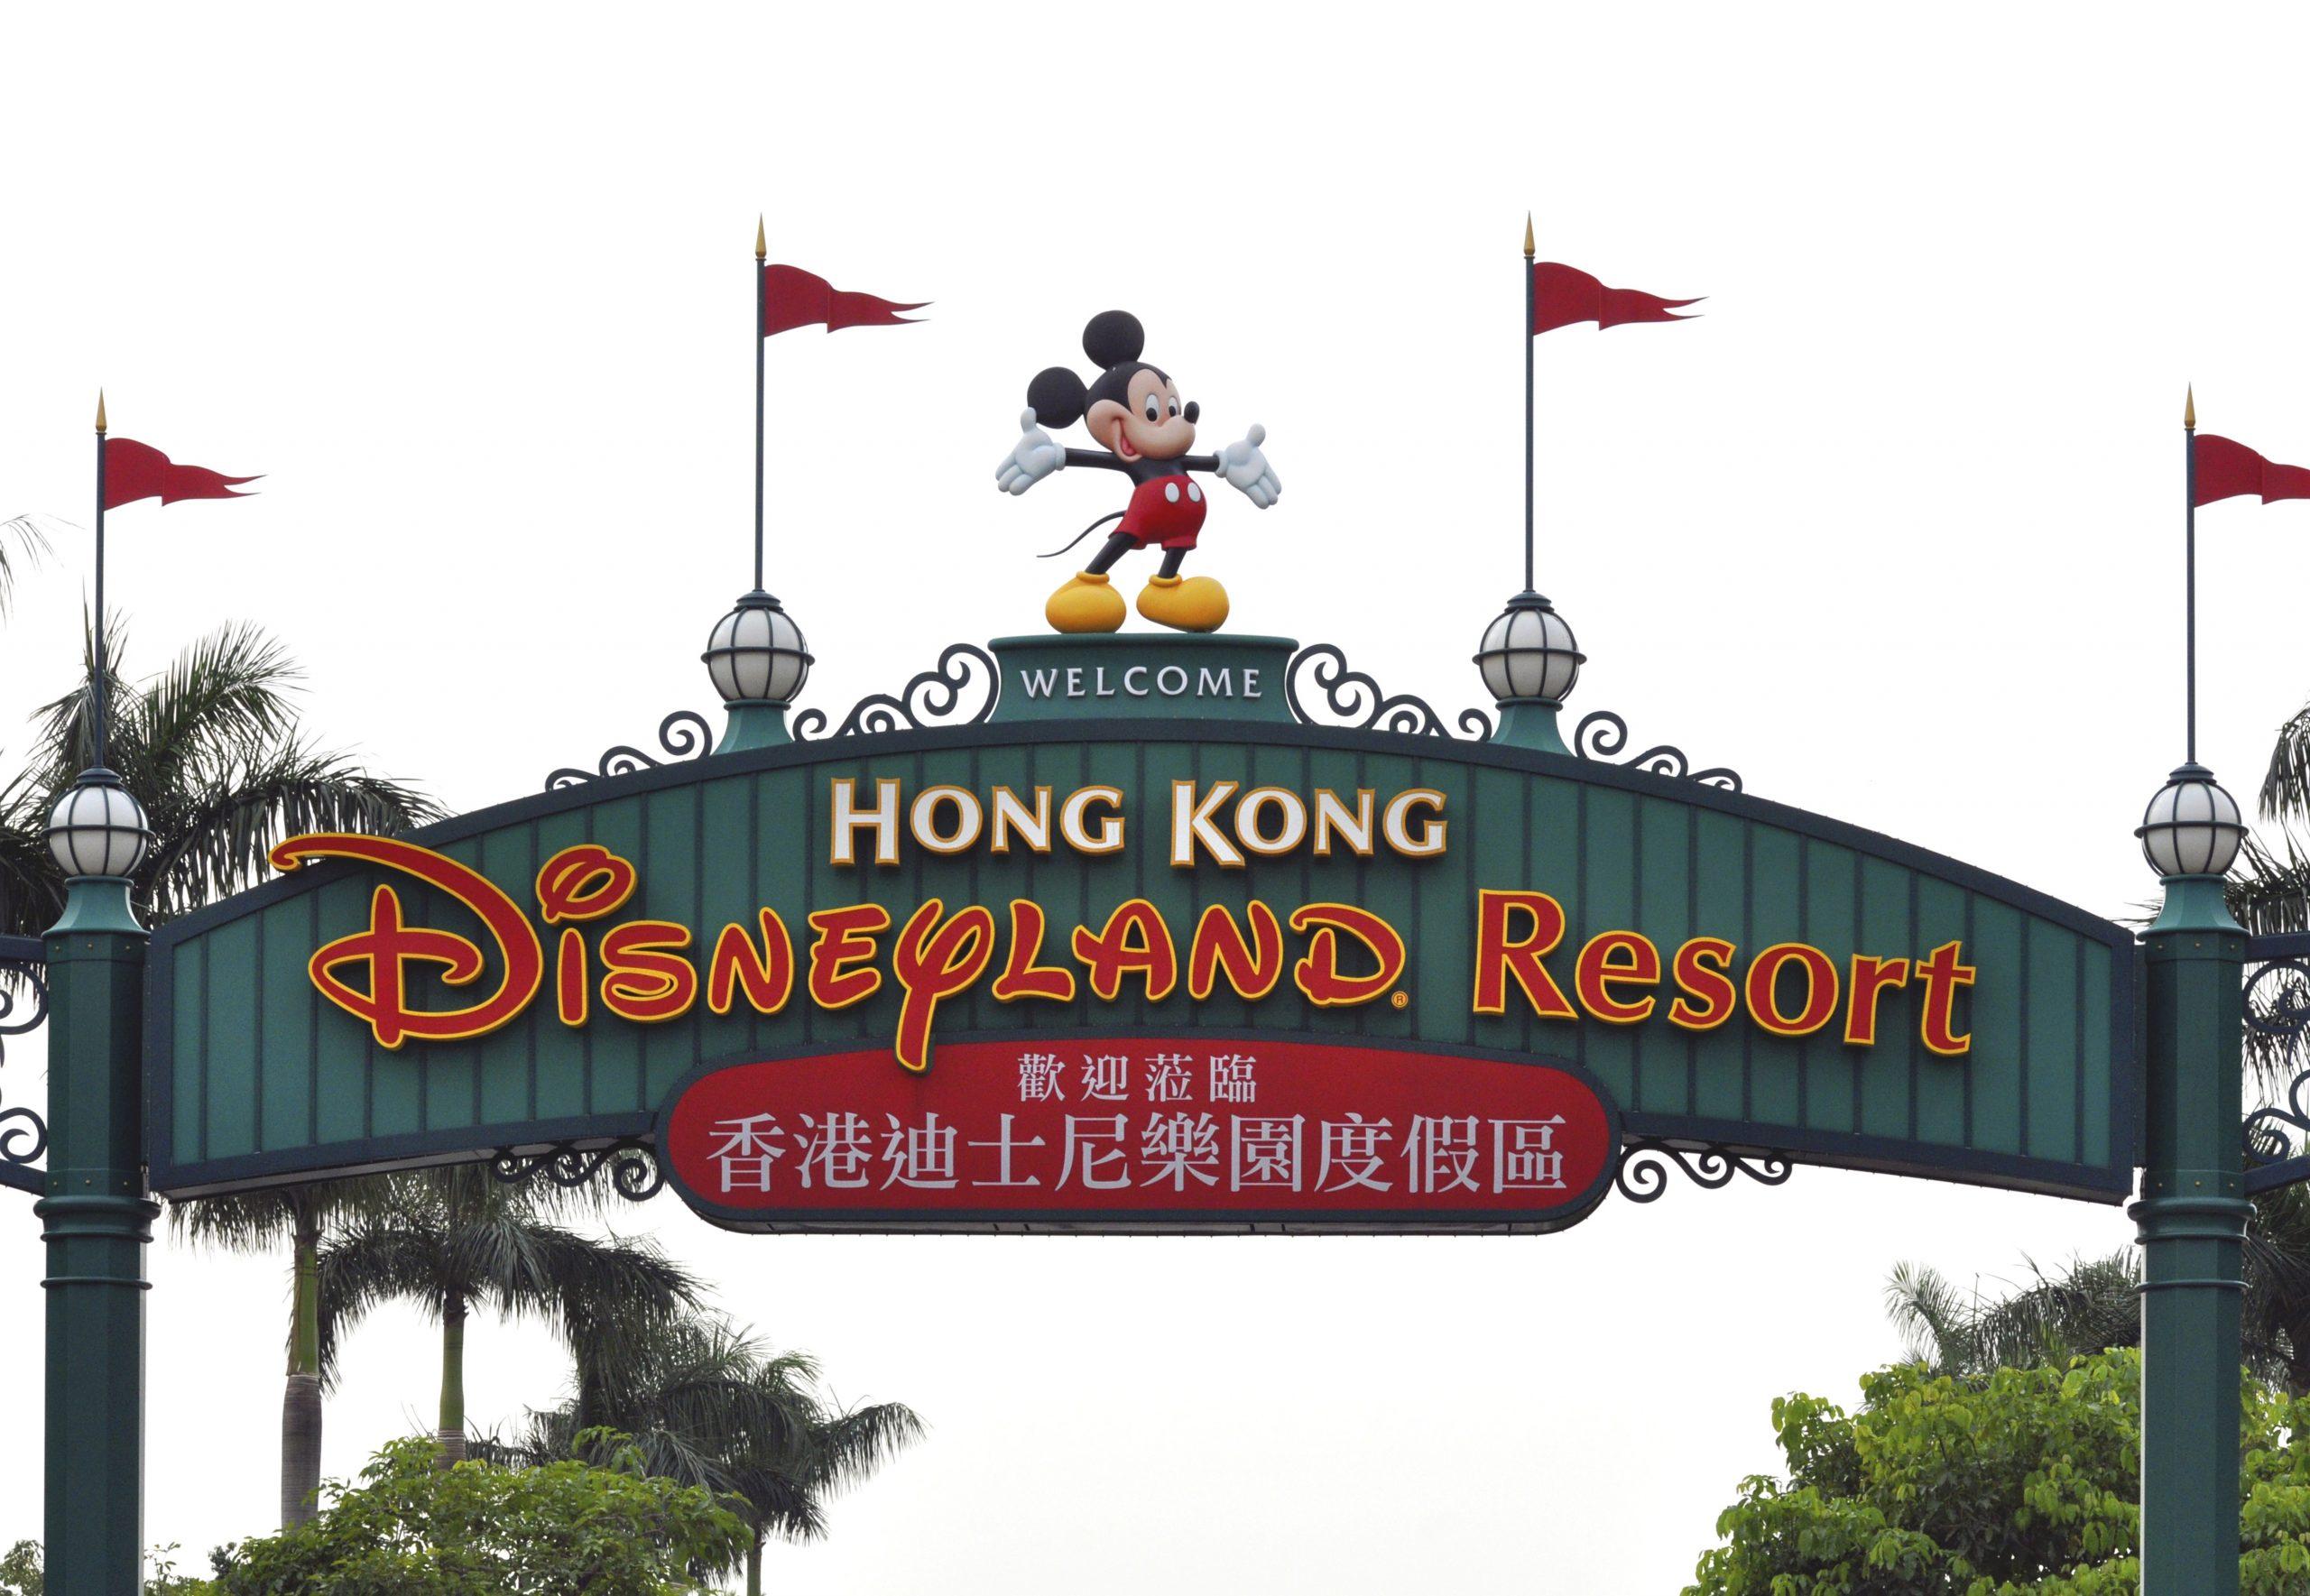 Hong Kong Disneyland – Welcome Sign